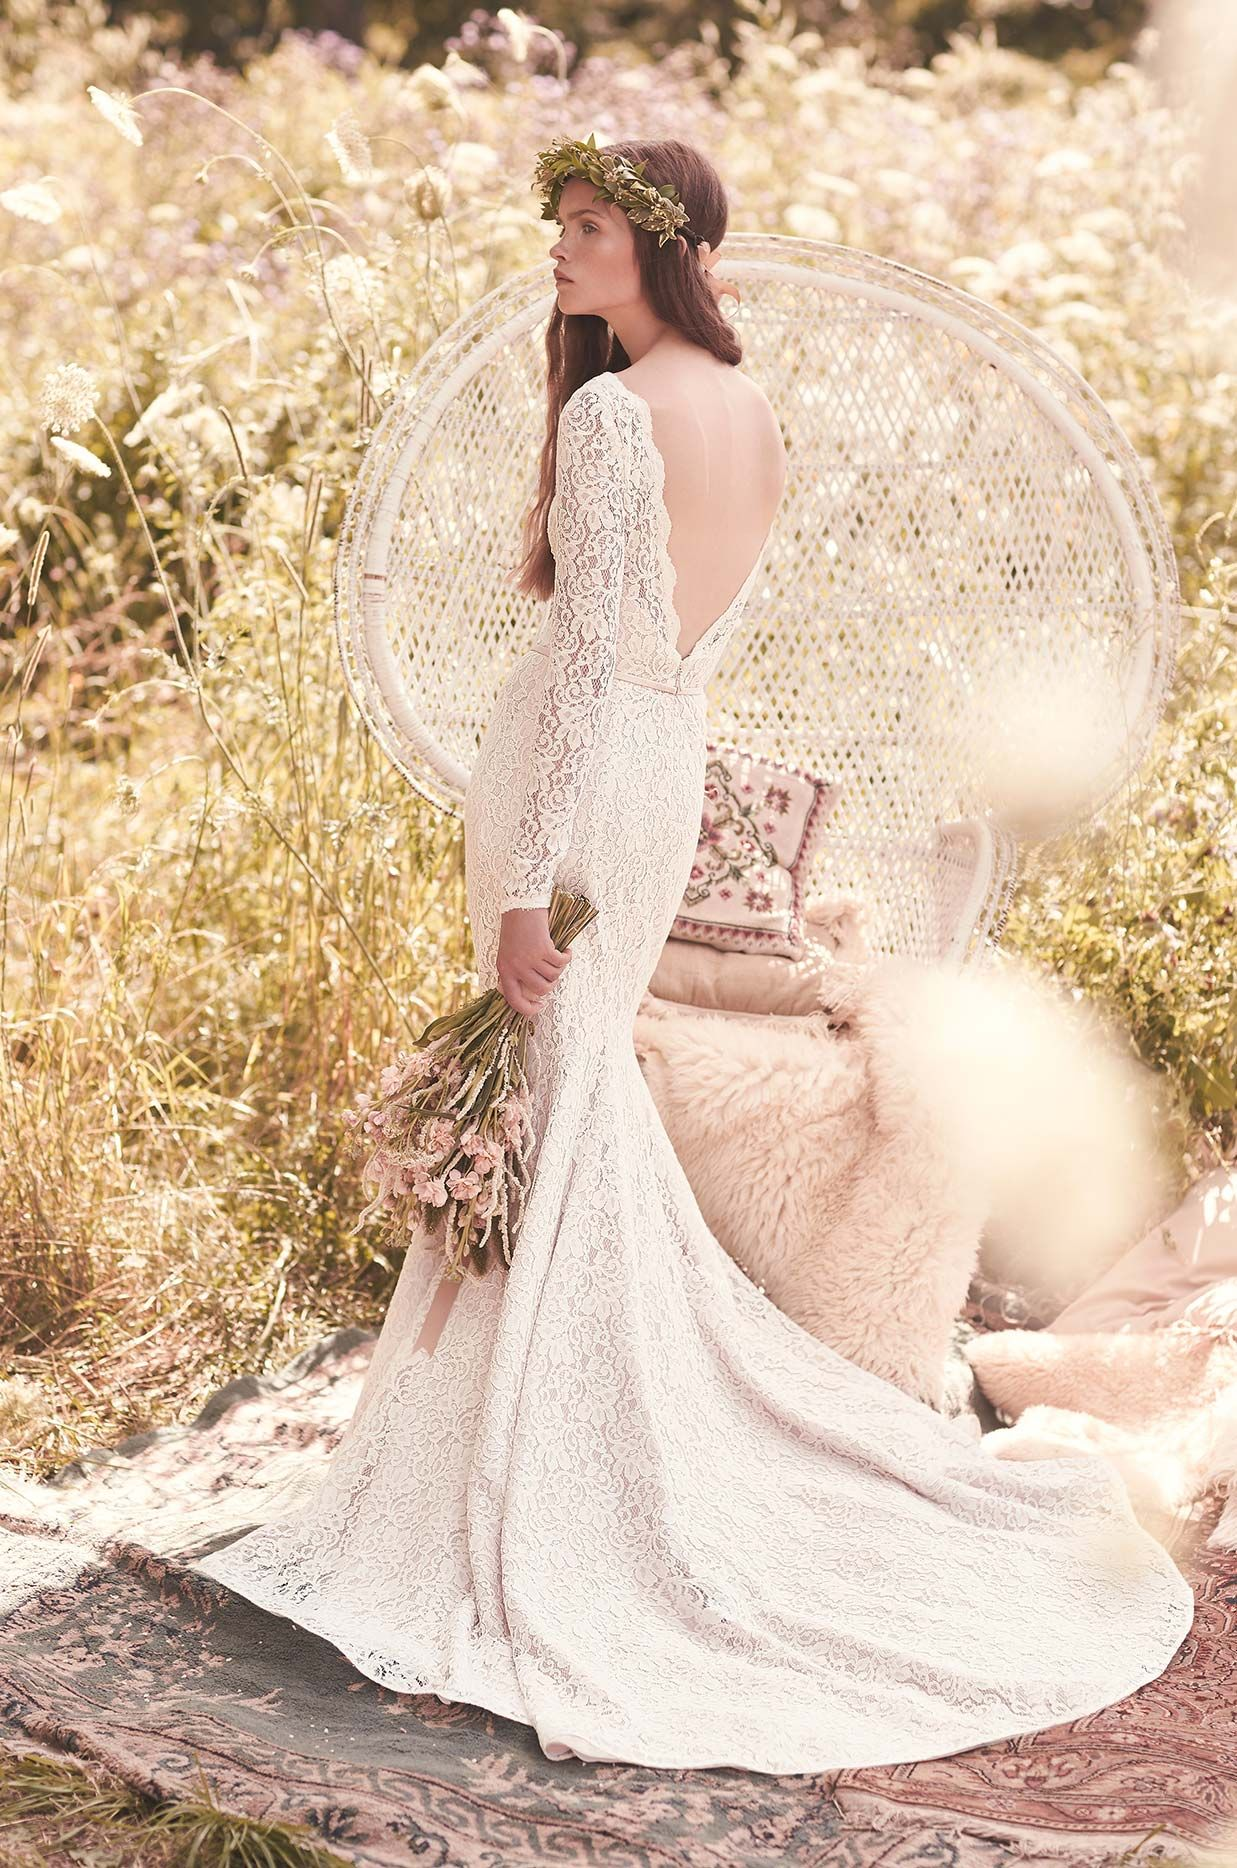 Long sleeve wedding dress style mikaella bridal bridal